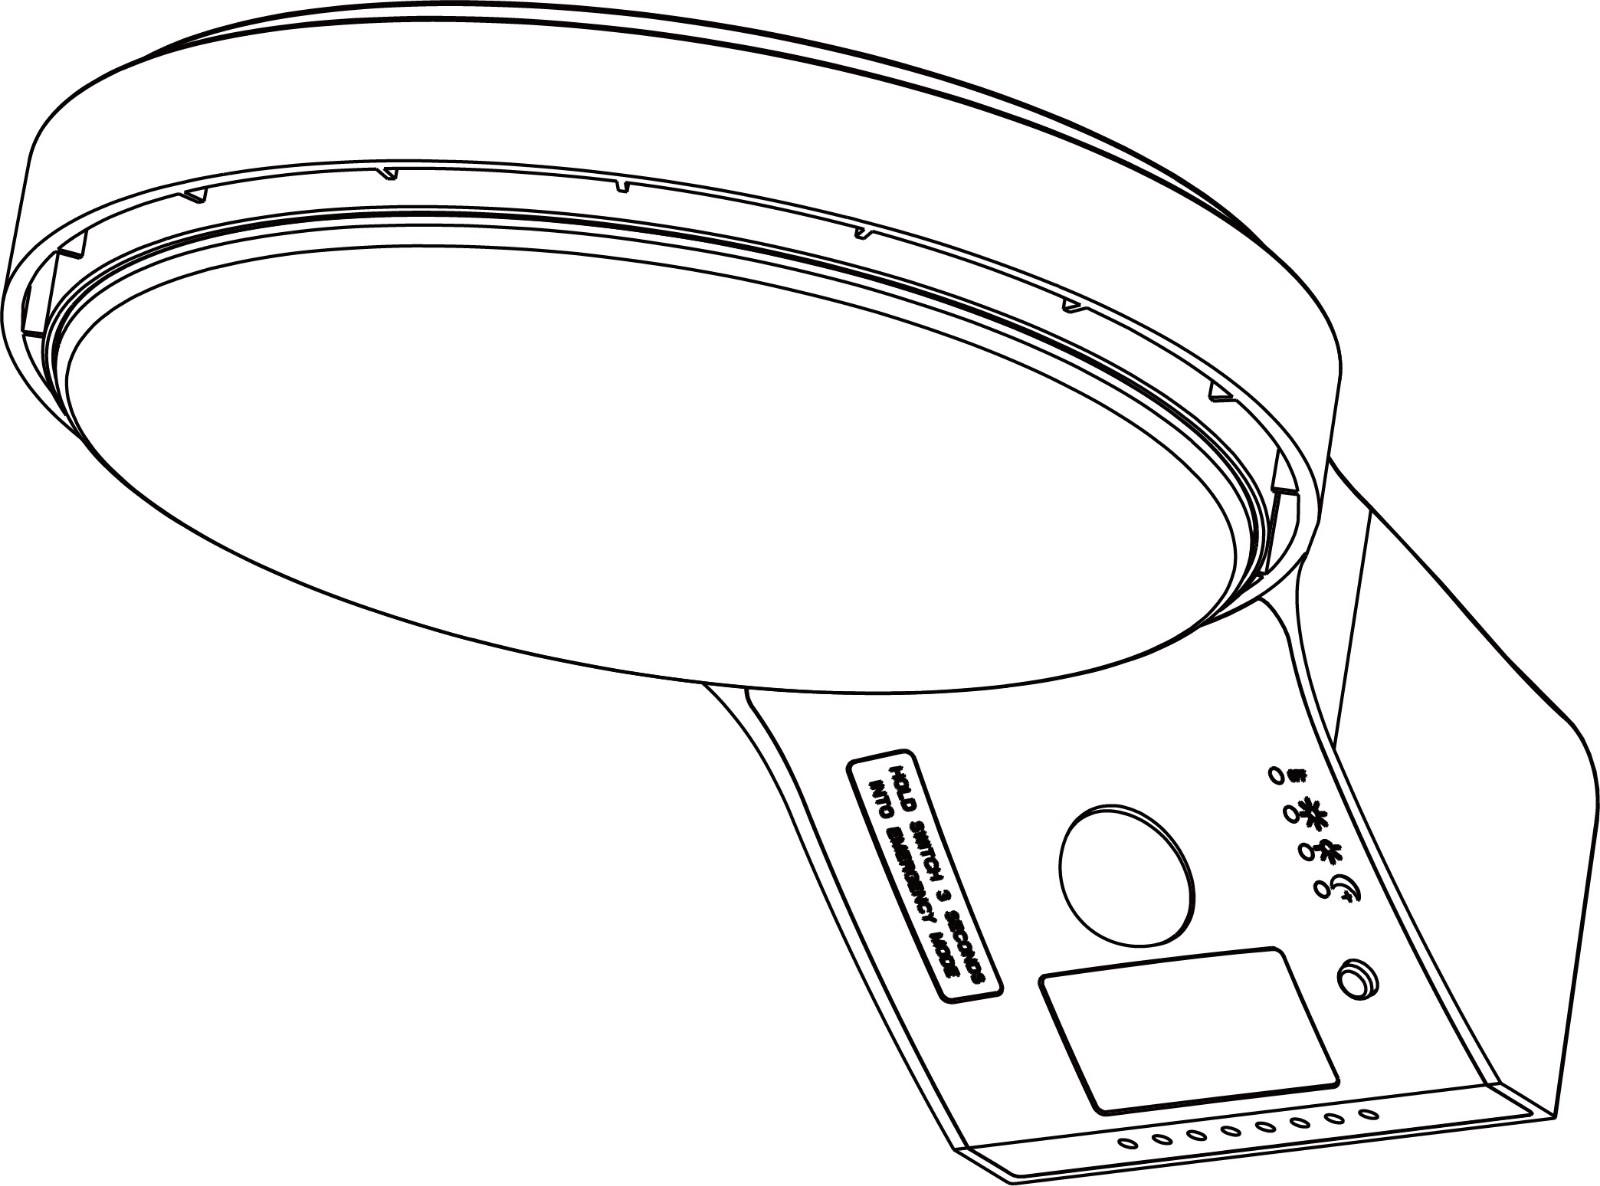 product-SEEKING-Solar LED Wall Light-img-1